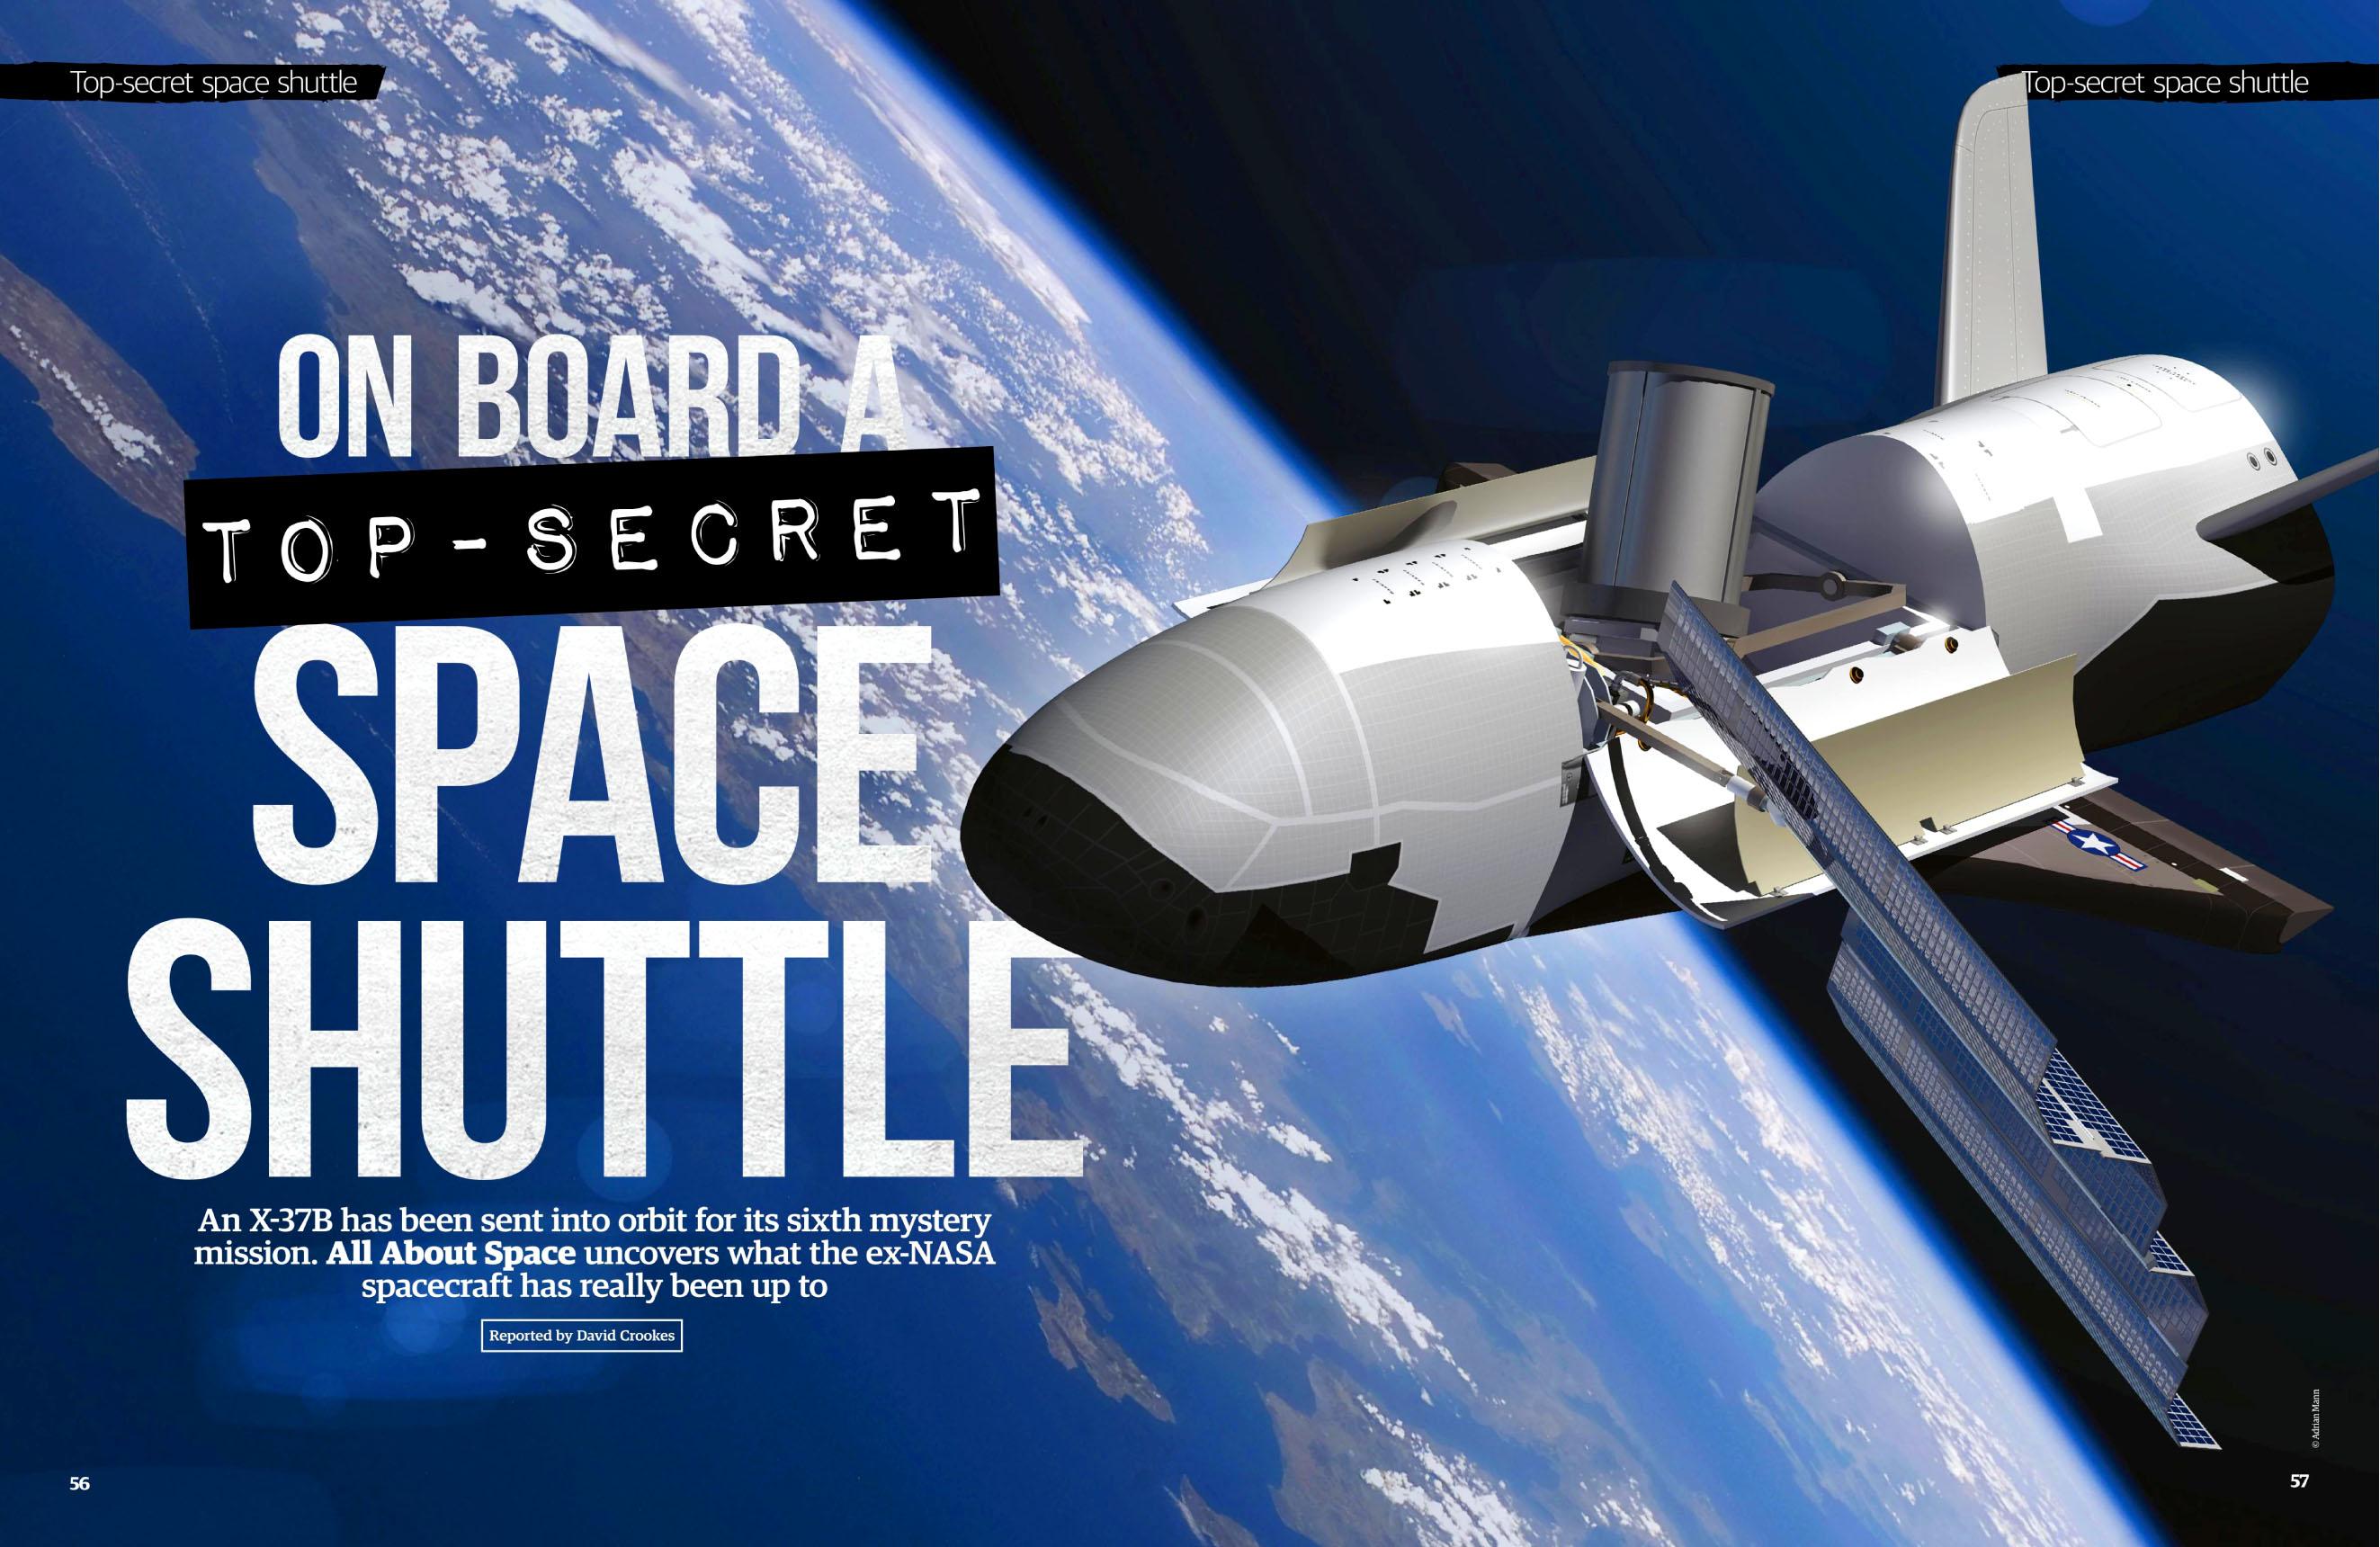 All About Space 107 2020 Secret Shuttle 01.jpg